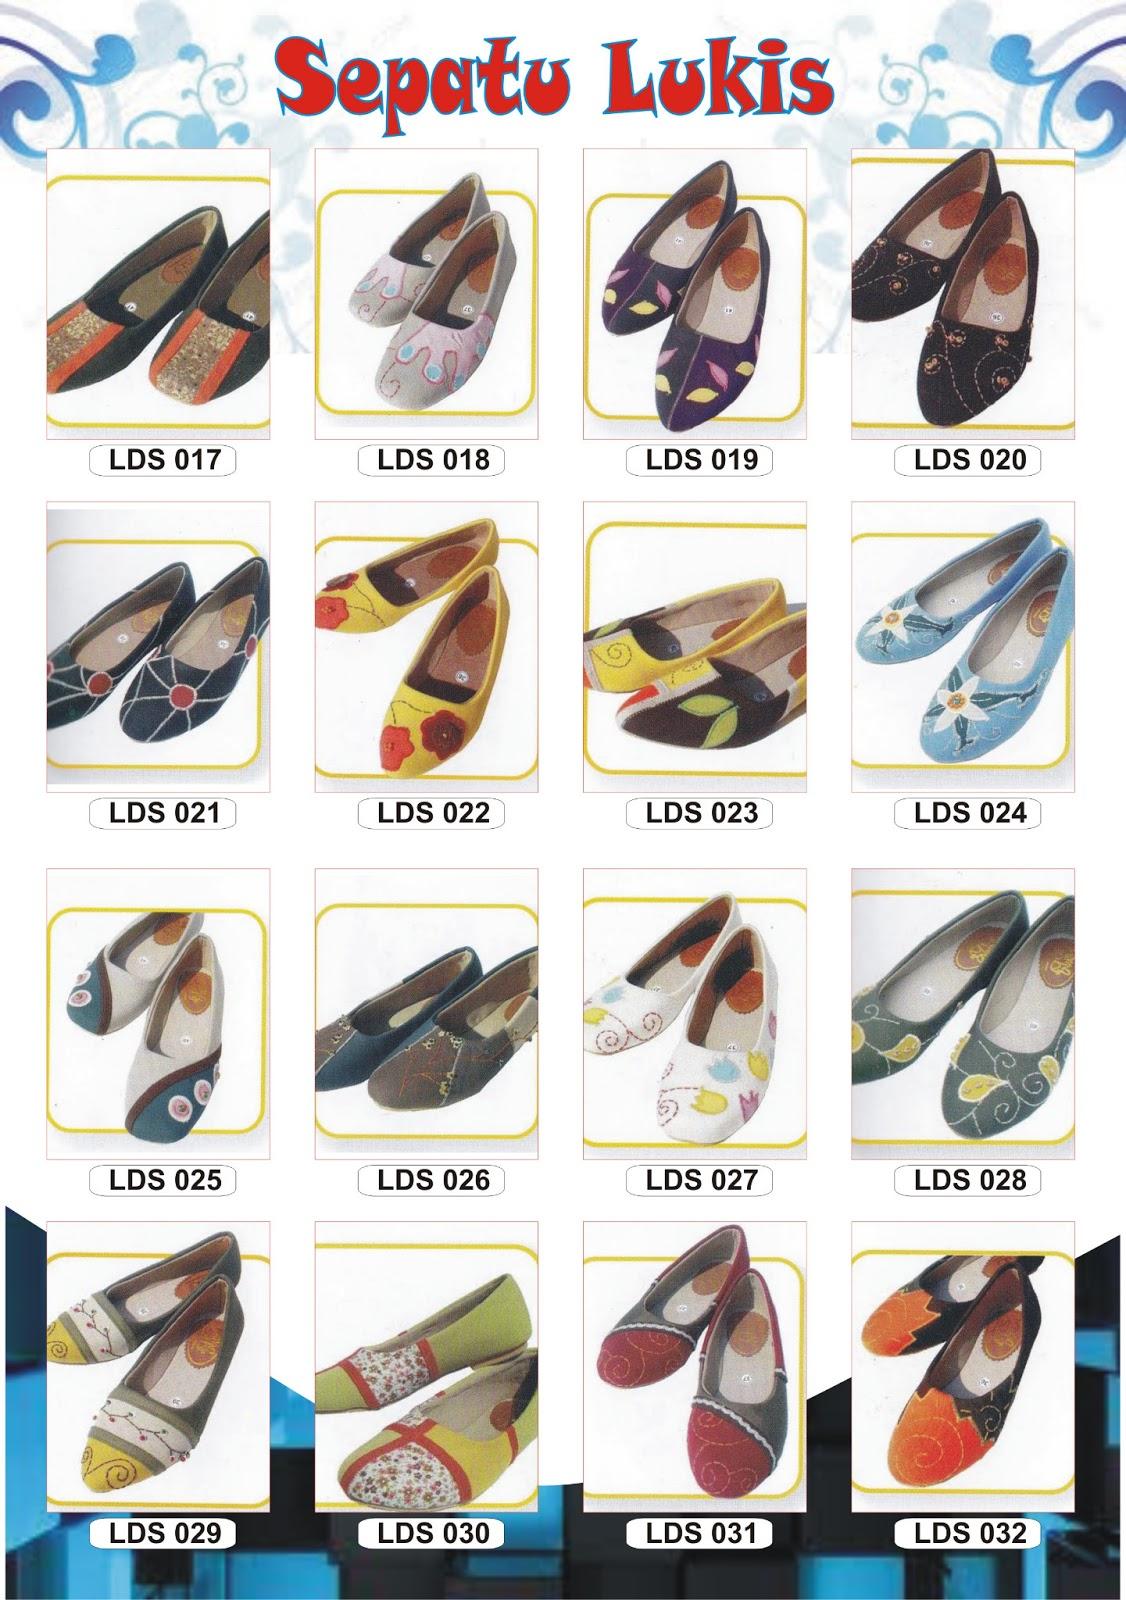 Sepatu Lukis Spesial Ibu-ibu muda & ABG | om_@gin